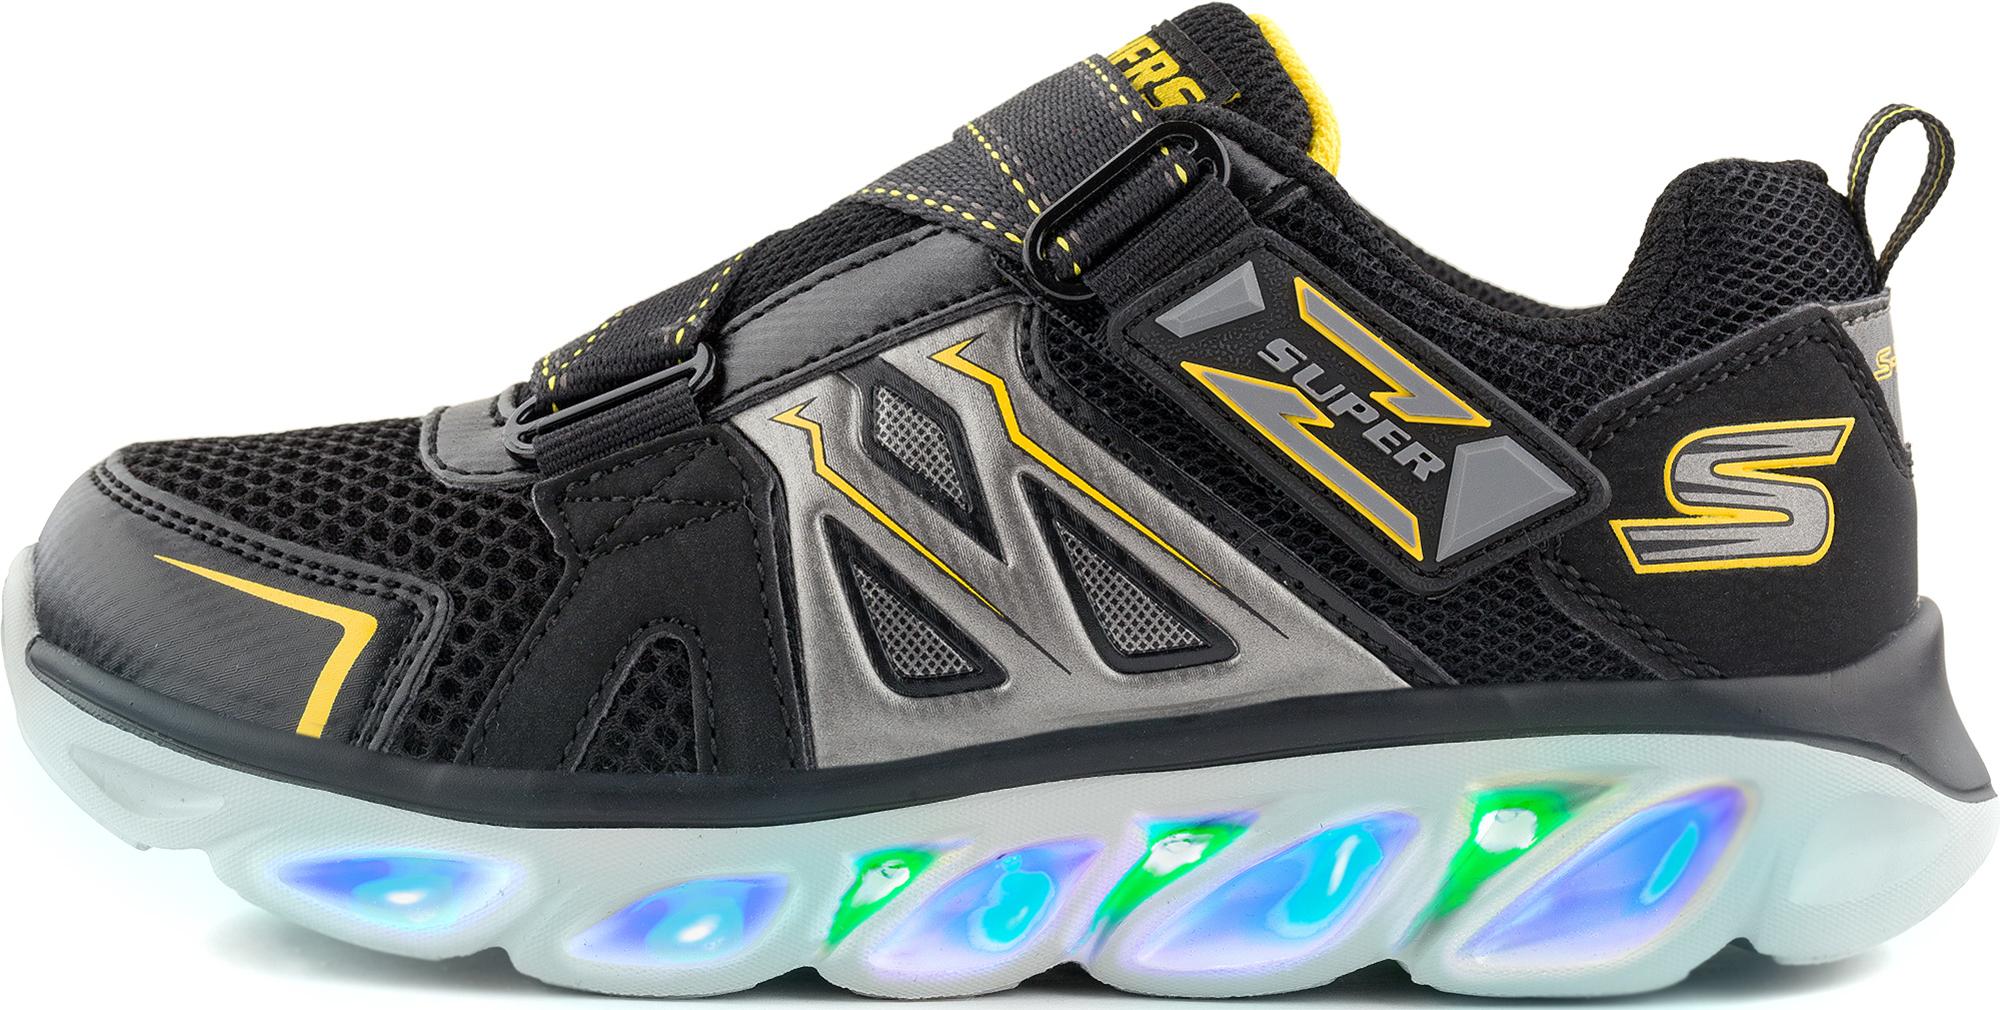 Skechers Кроссовки для мальчиков Hypno-Flash 3.0-Swiftest, размер 27,5